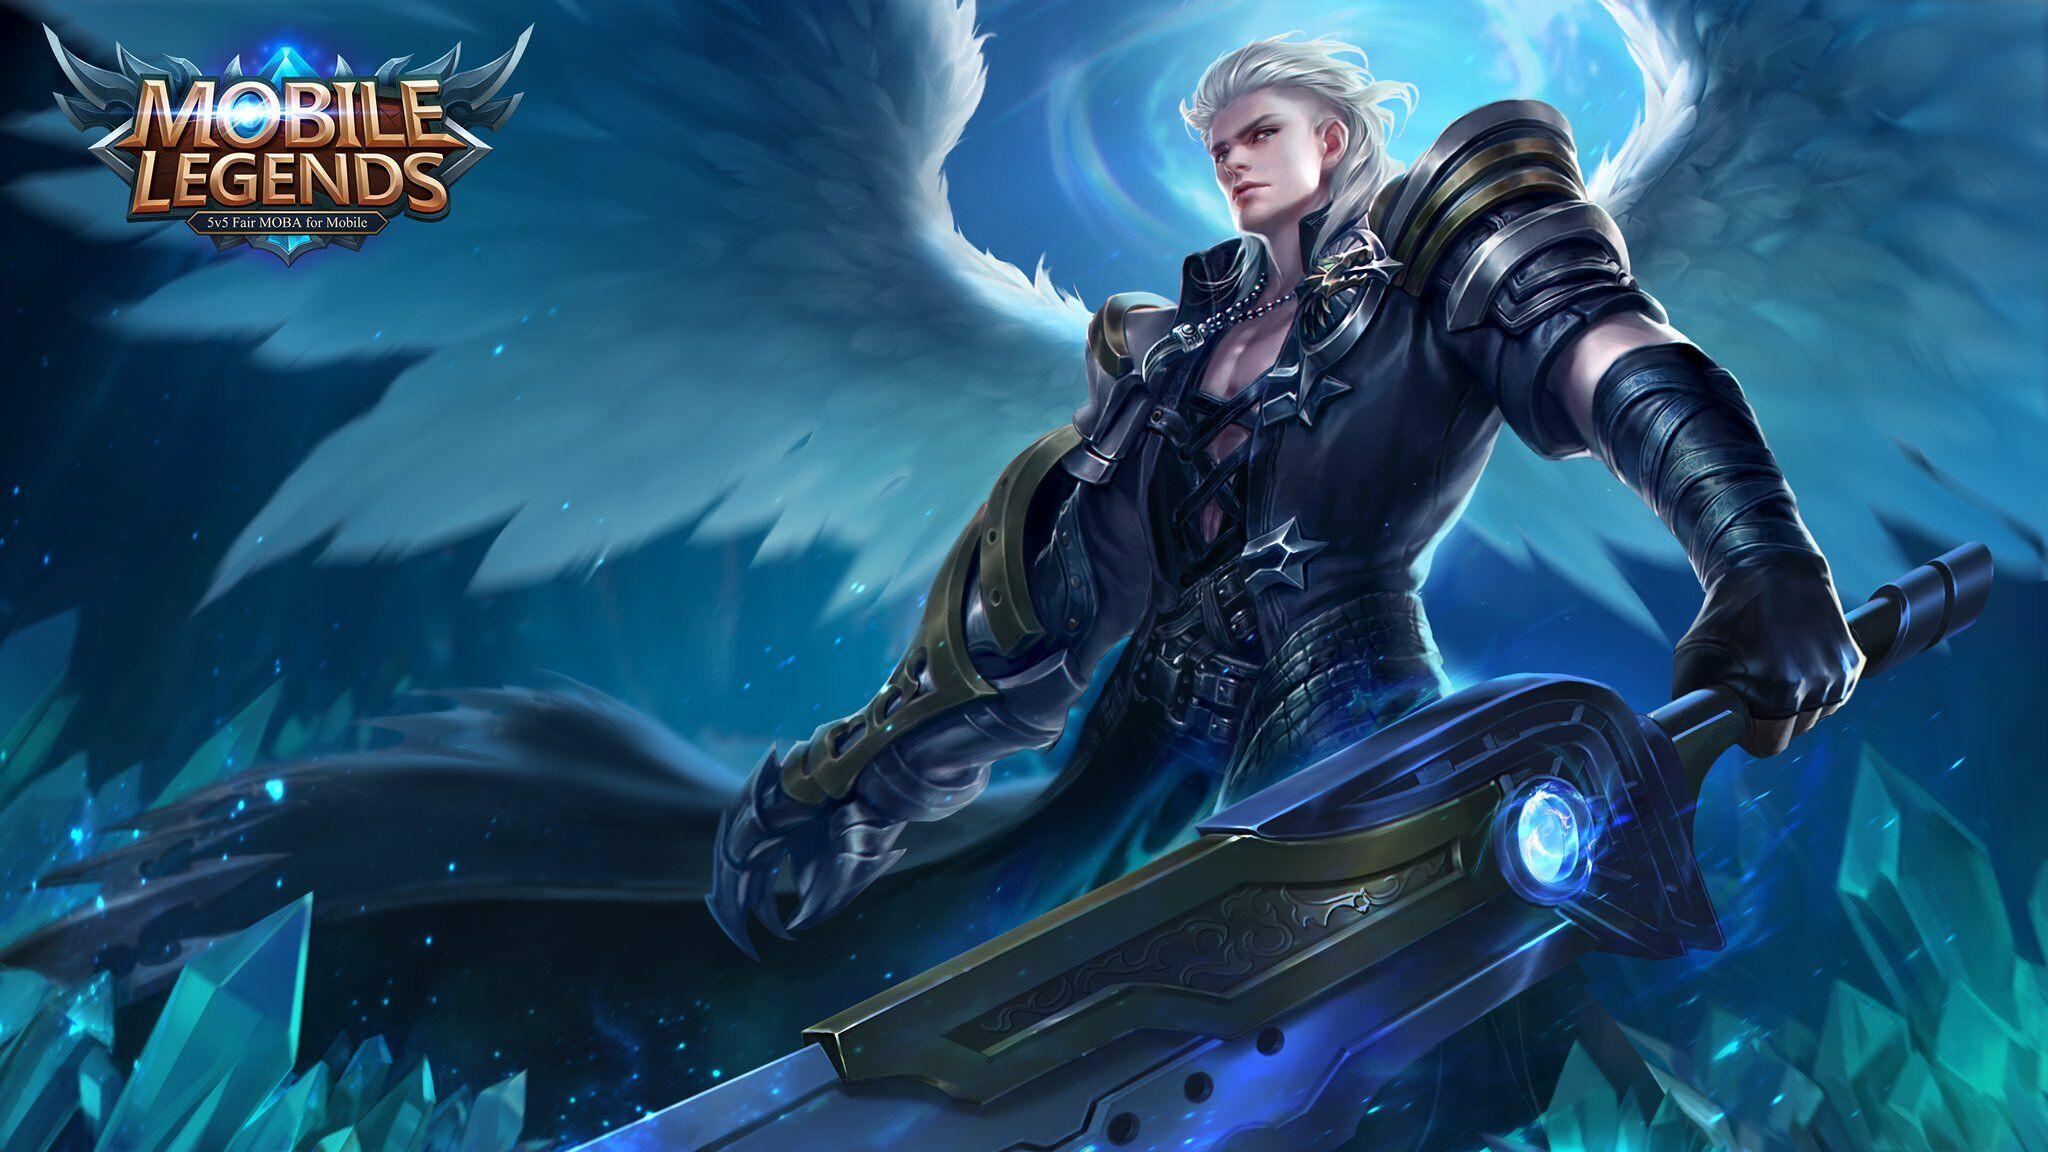 Wallpaper-Mobile-Legends-Alucard